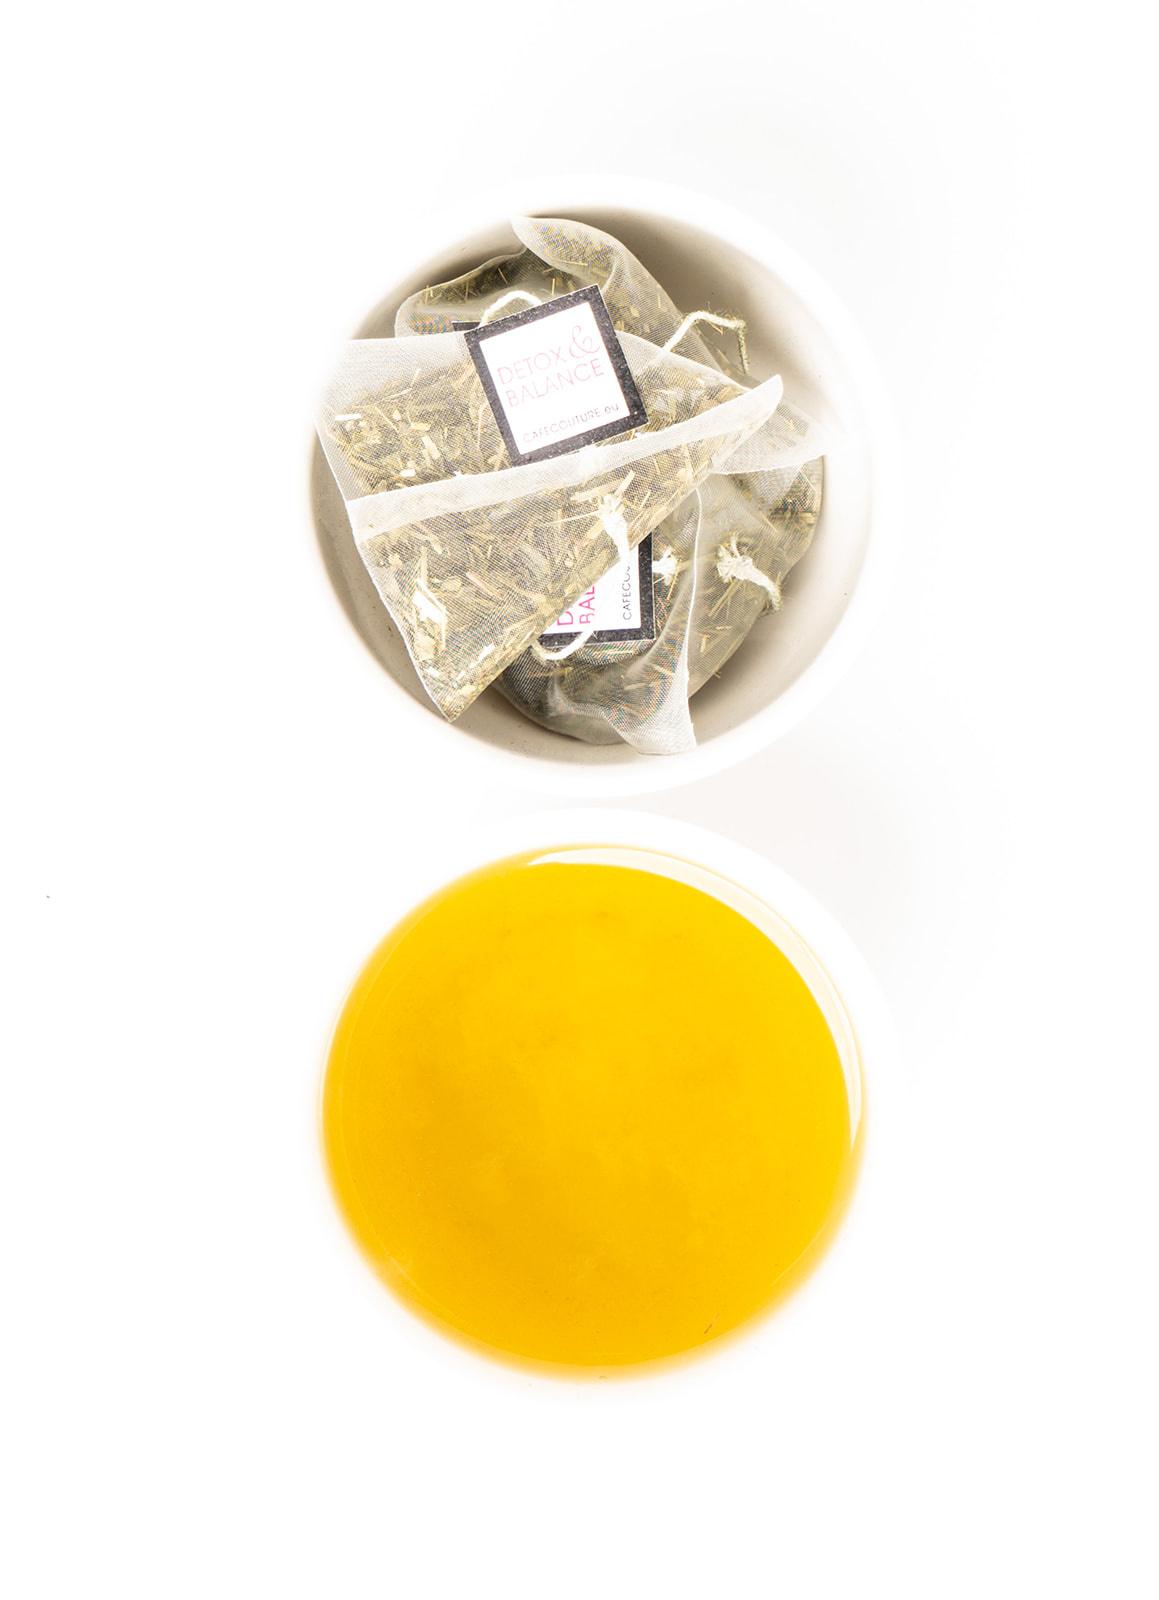 SLIMMING DETOX - GREEN TEA, MATE & SPIRULINA